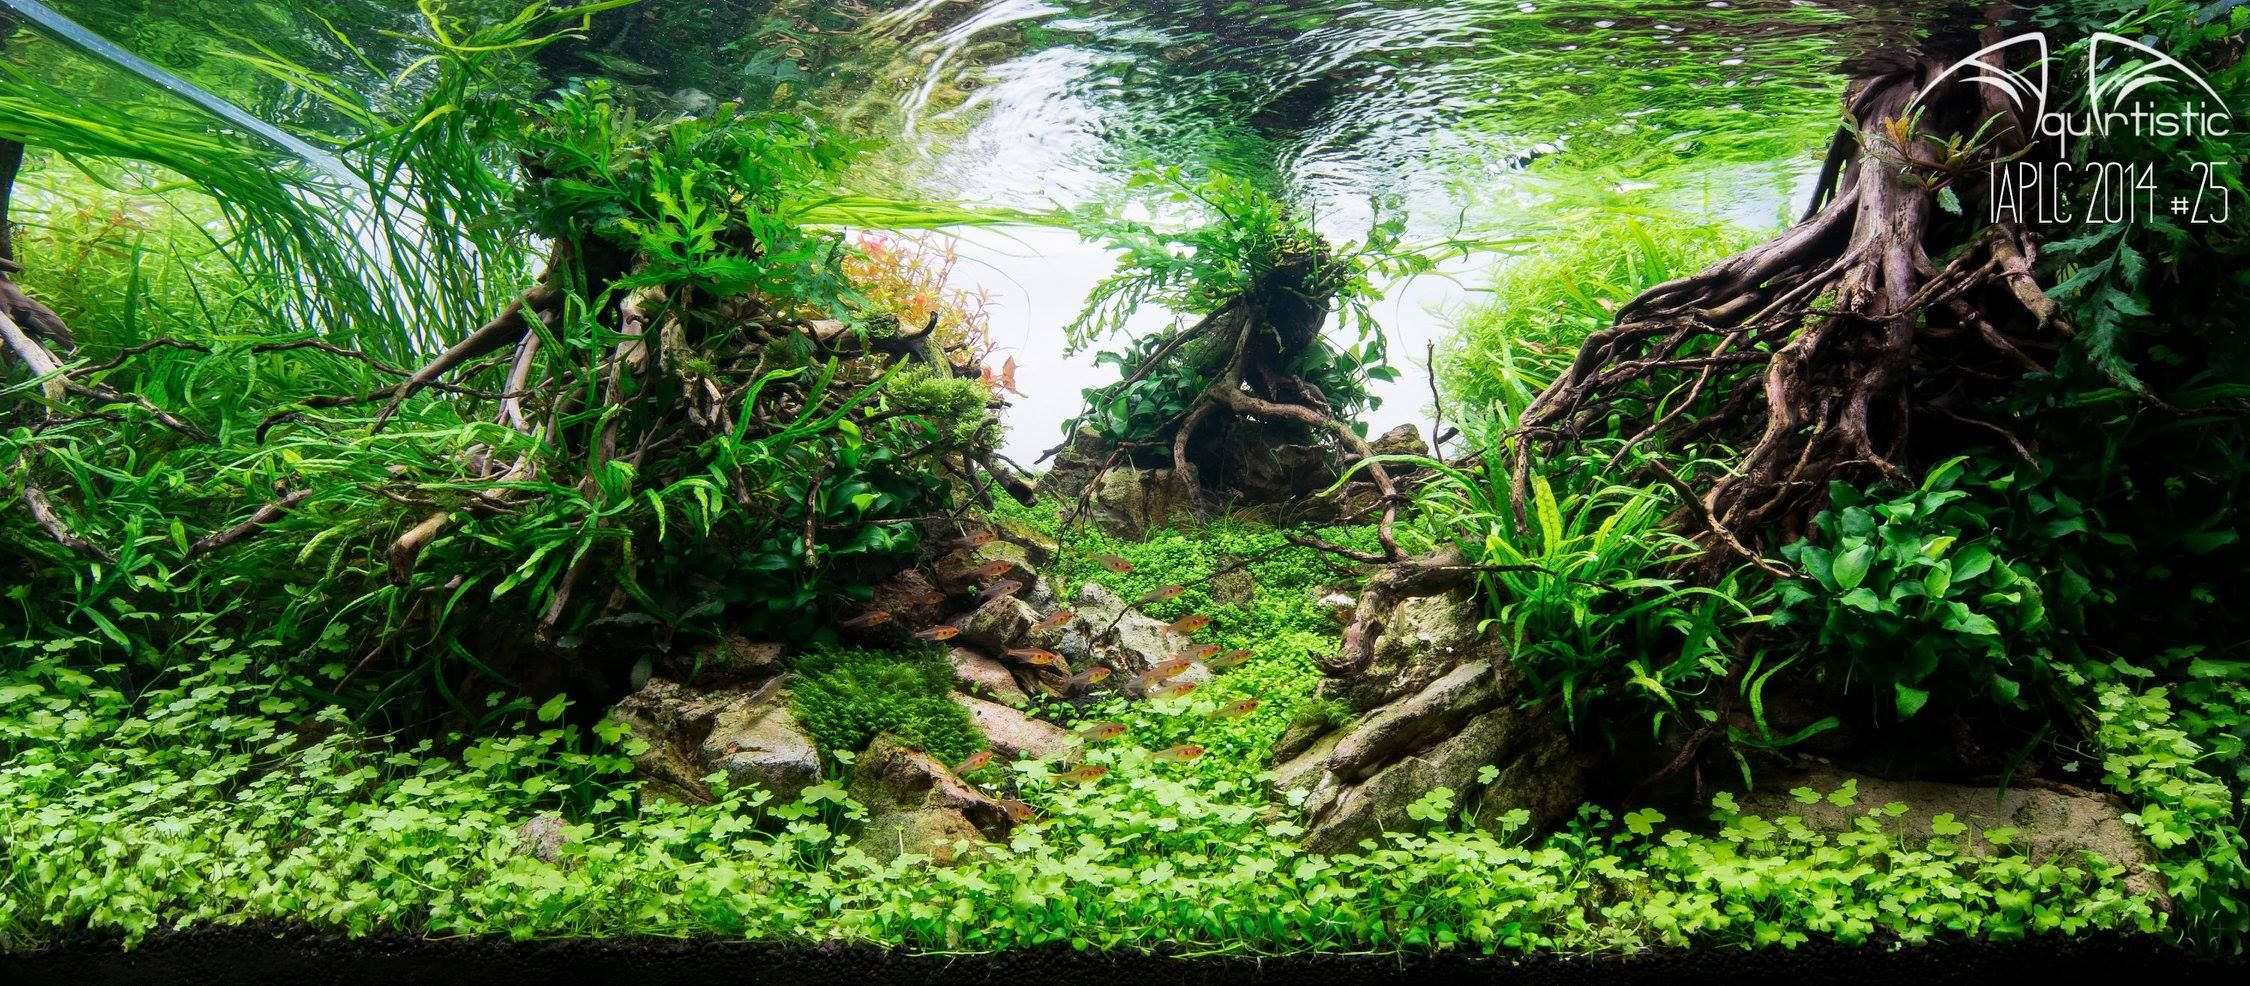 d0b50d49a4324e7a028643367c94c8f7 Frais De Aquarium Tropical Schème